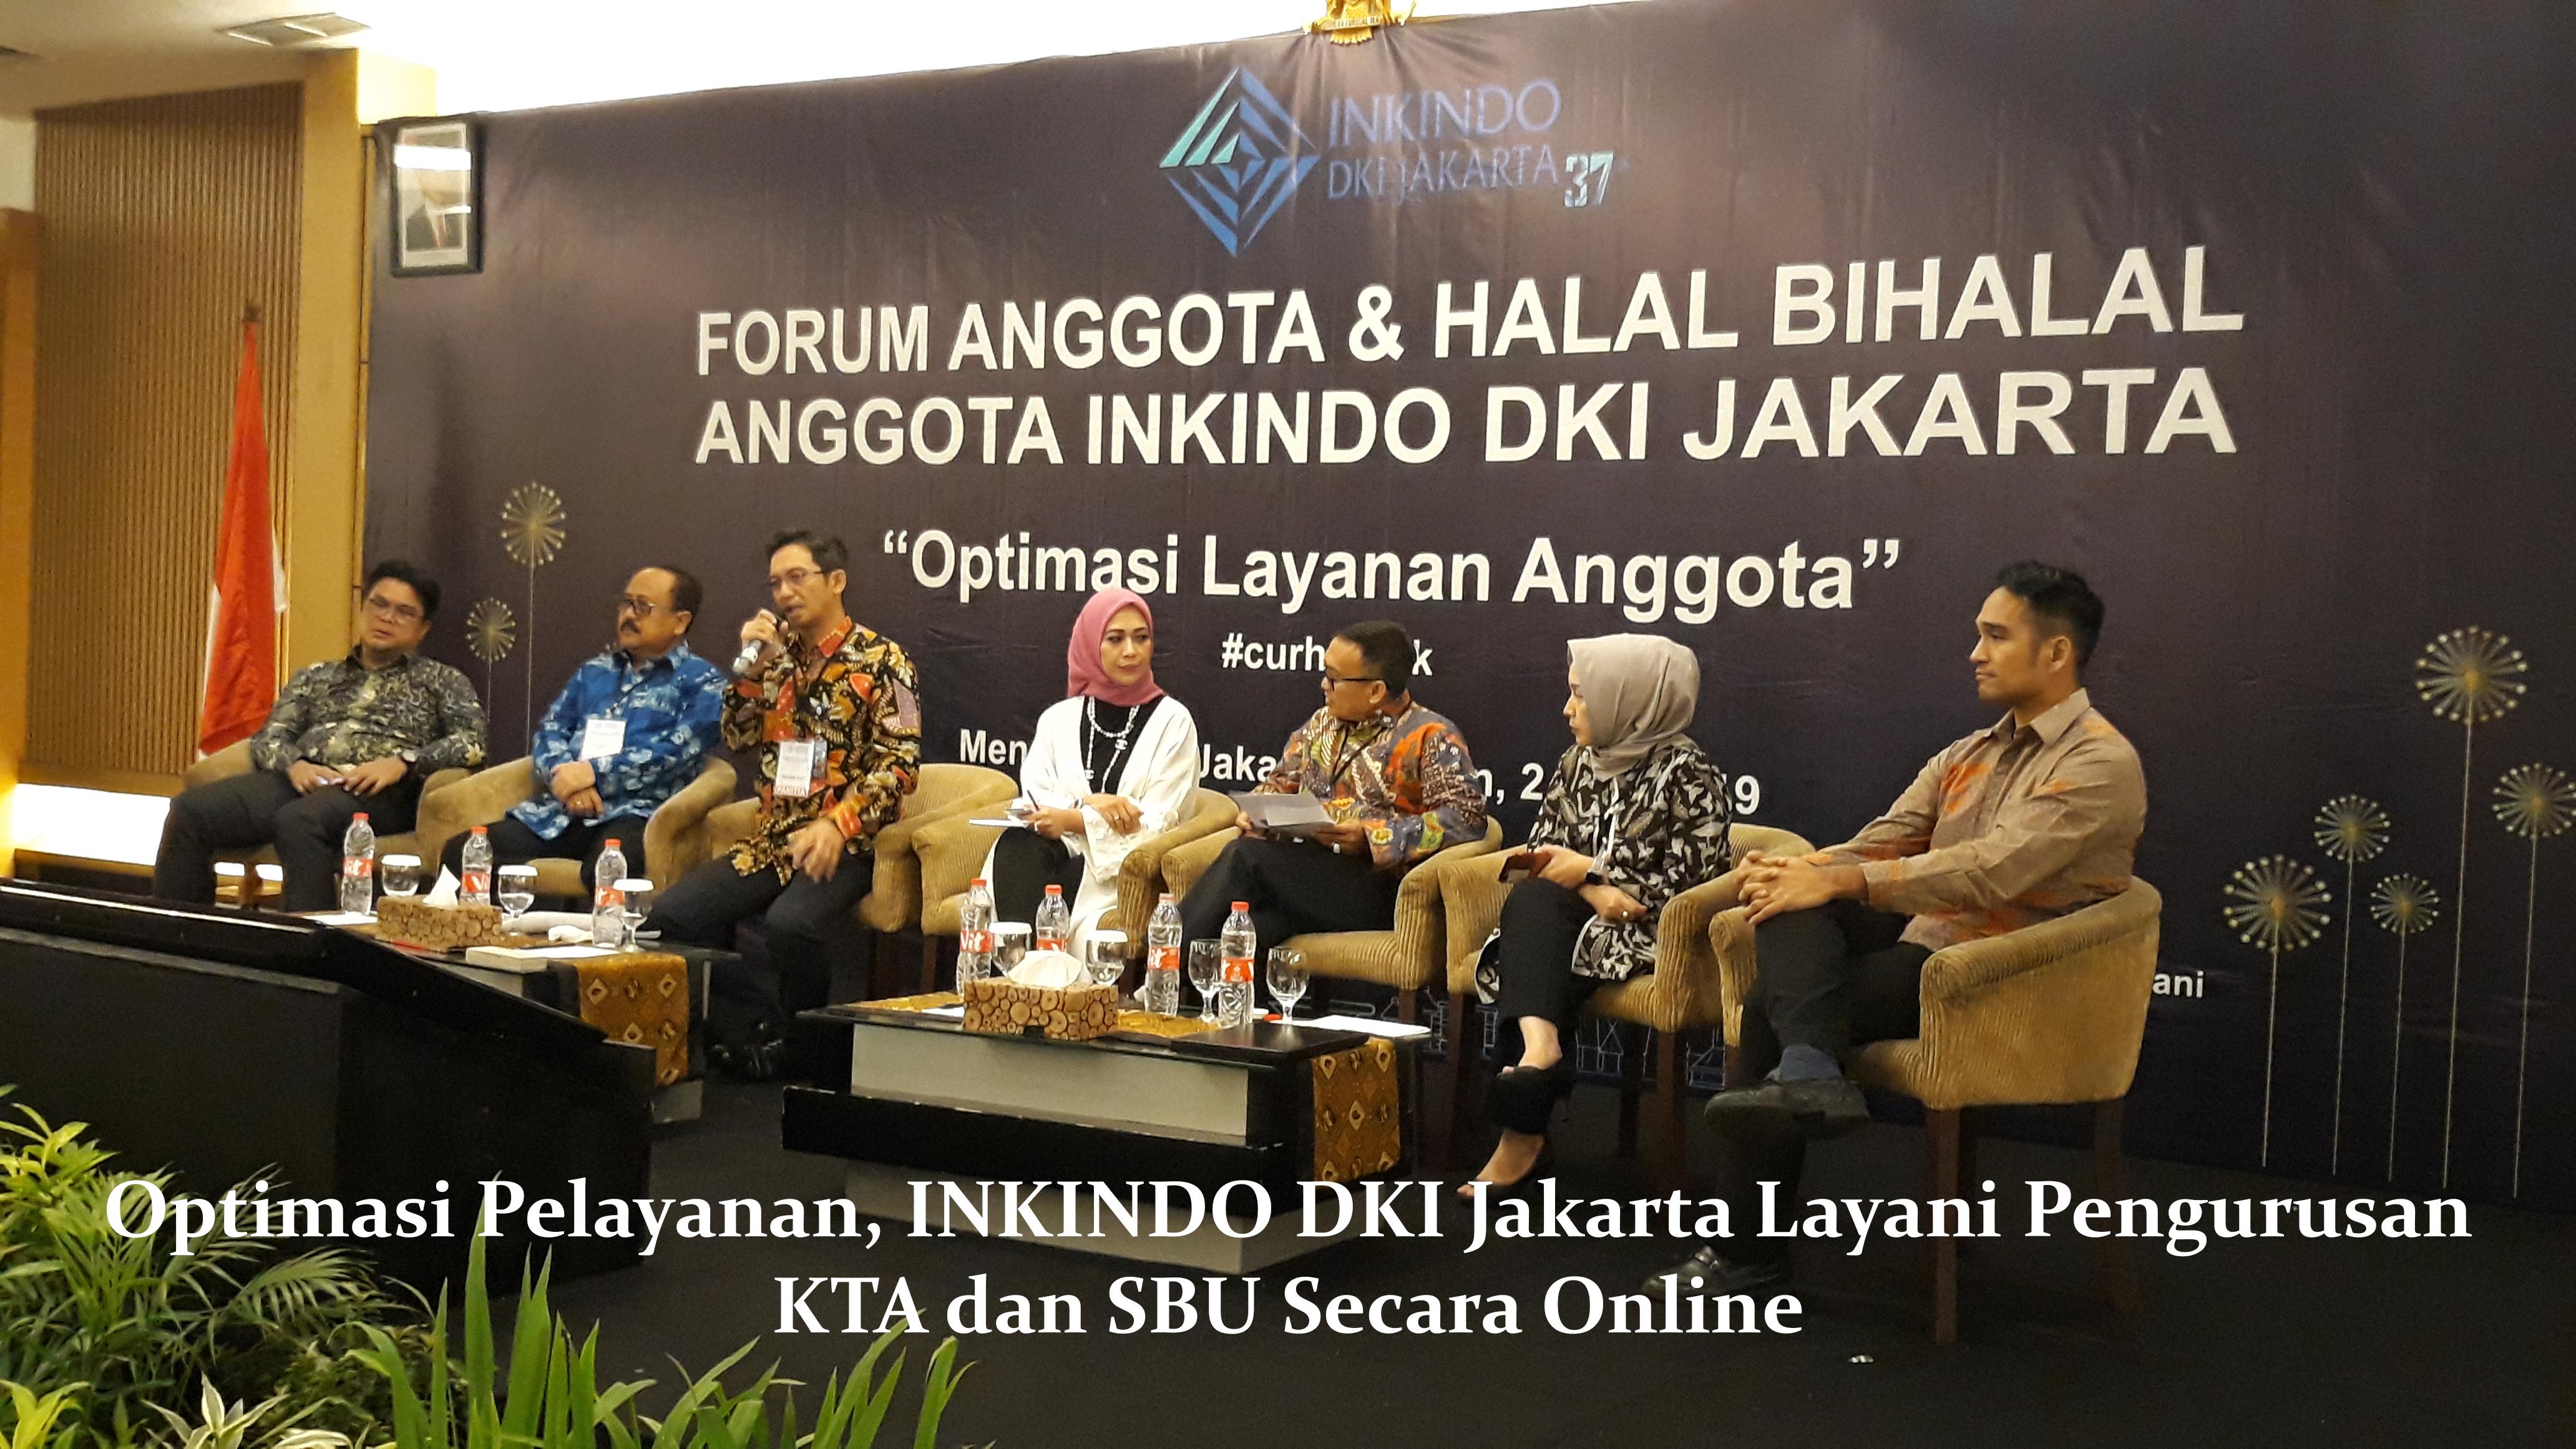 Optimasi Pelayanan, INKINDO DKI Jakarta Layani Pengurusan KTA dan SBU Secara Online